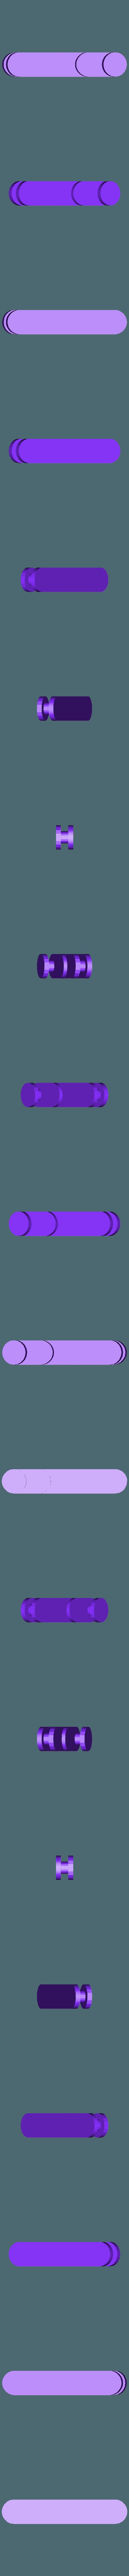 5cm_Strap_Pegs.stl Download free STL file Flexible Filament Bikini Top and Bottom • 3D printable design, SexyCyborg